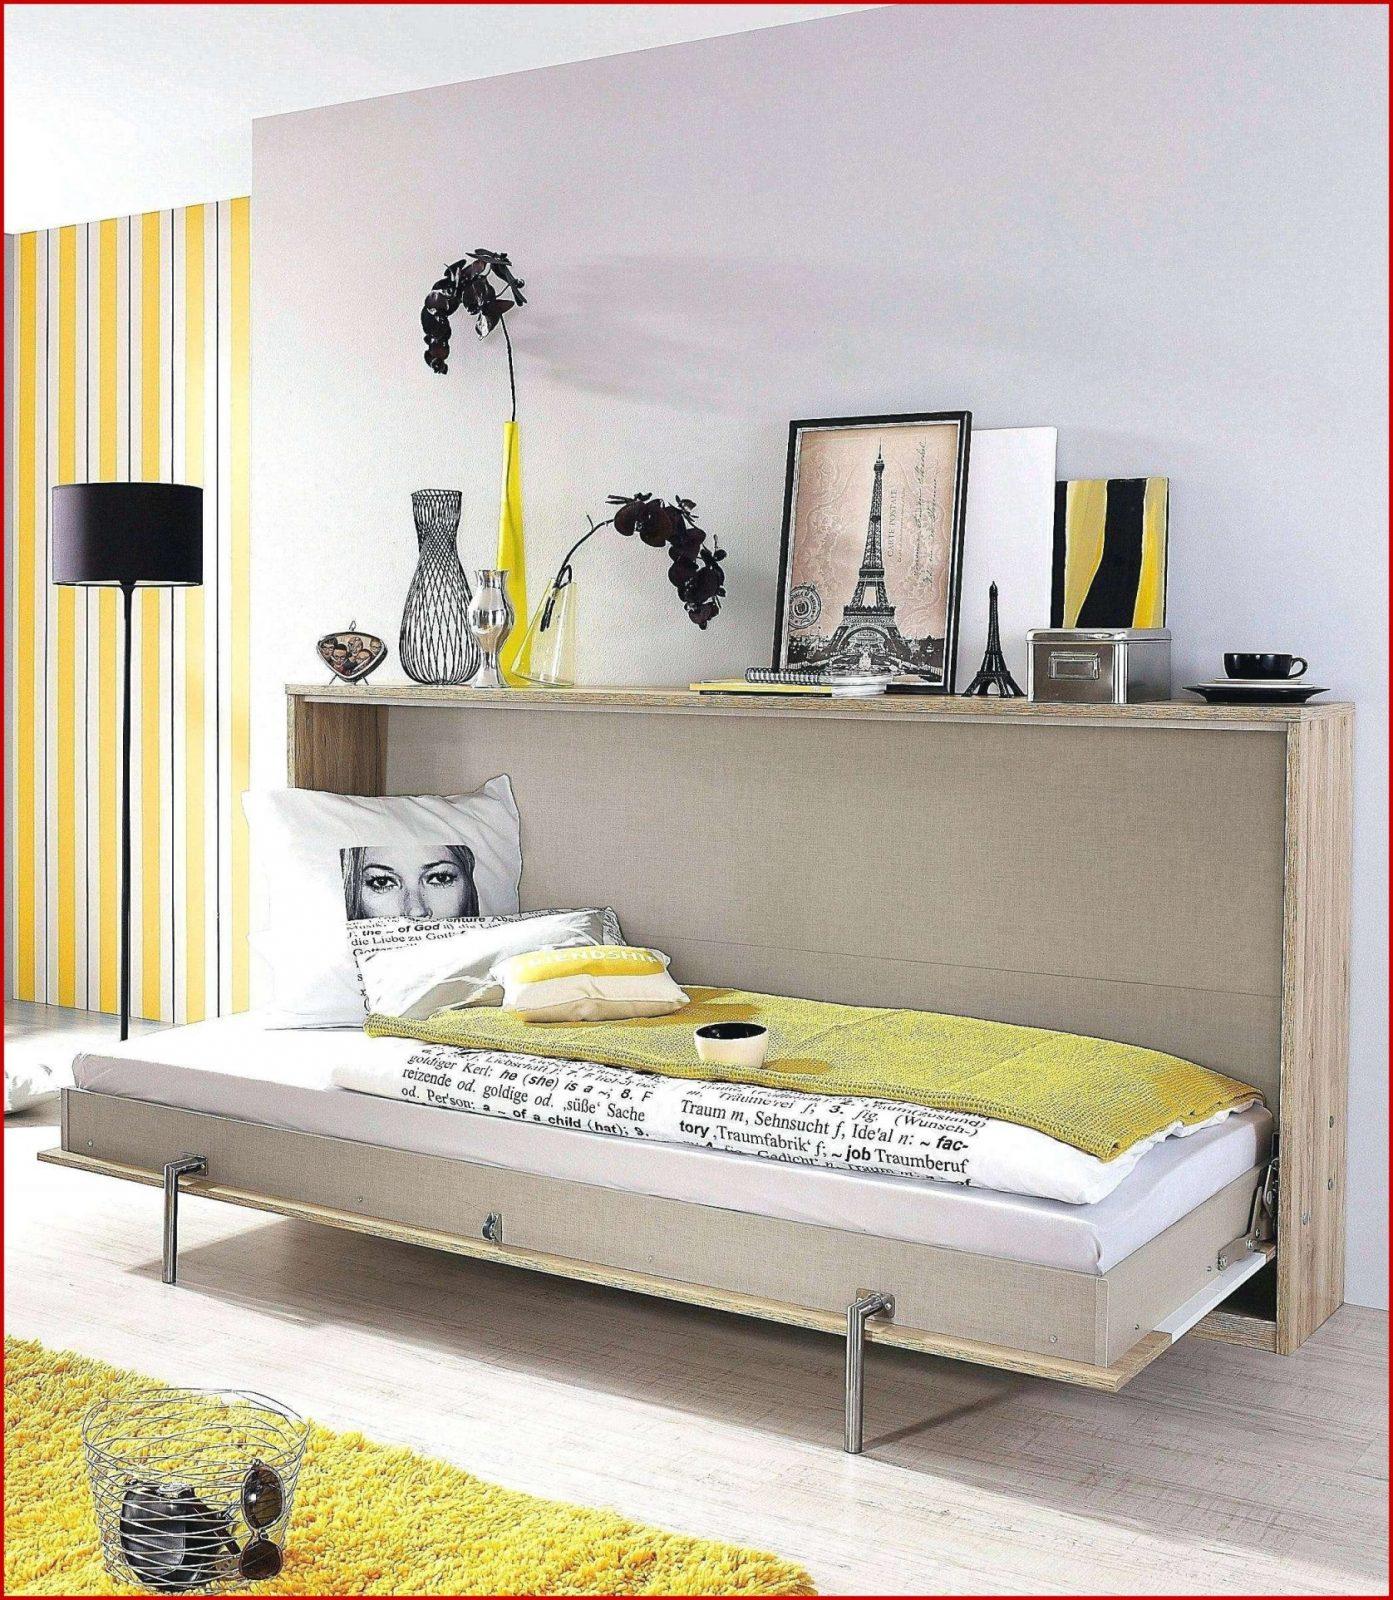 Matras 200 X 220 106221 Matras 200 X 180 Luxe Bett 80—200 Ikea von Bettwäsche 200X220 Ikea Bild